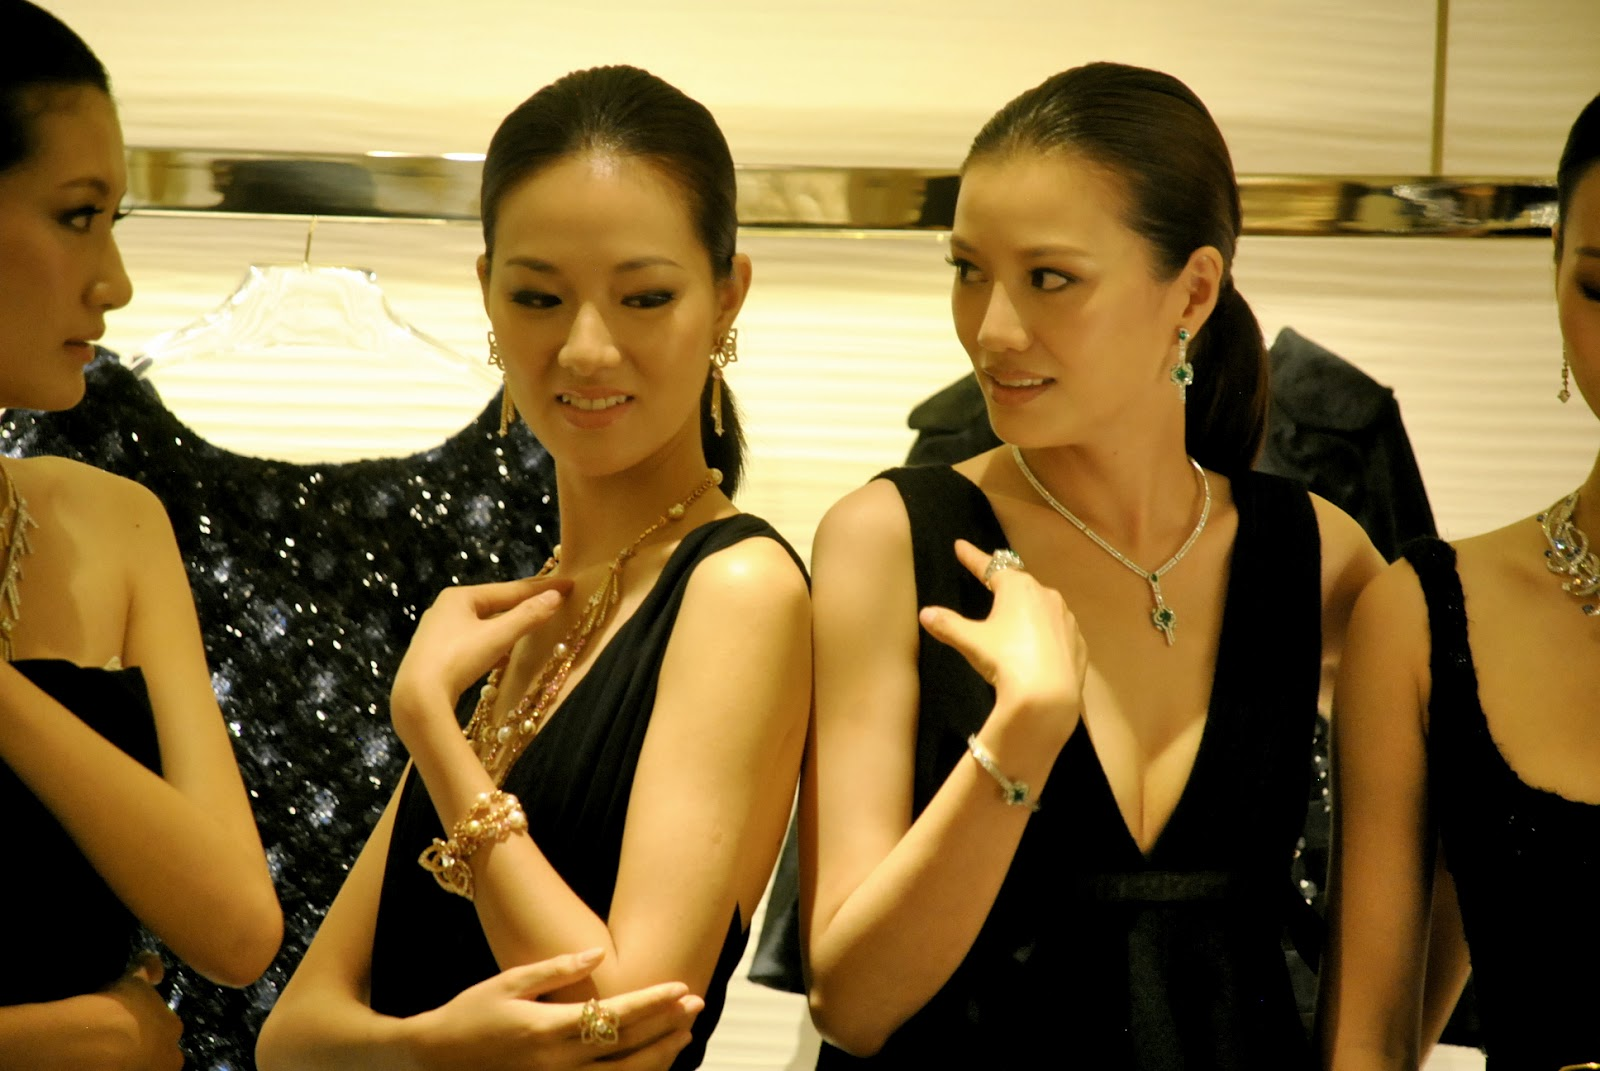 http://2.bp.blogspot.com/-UAFnC93axdM/UBwGwgPo3lI/AAAAAAABMHs/AZwb8Fk6AtA/s1600/Shanghai+Louis+Vuitton+Maison+Store+Opening+Cocktail+Party_0875.JPG